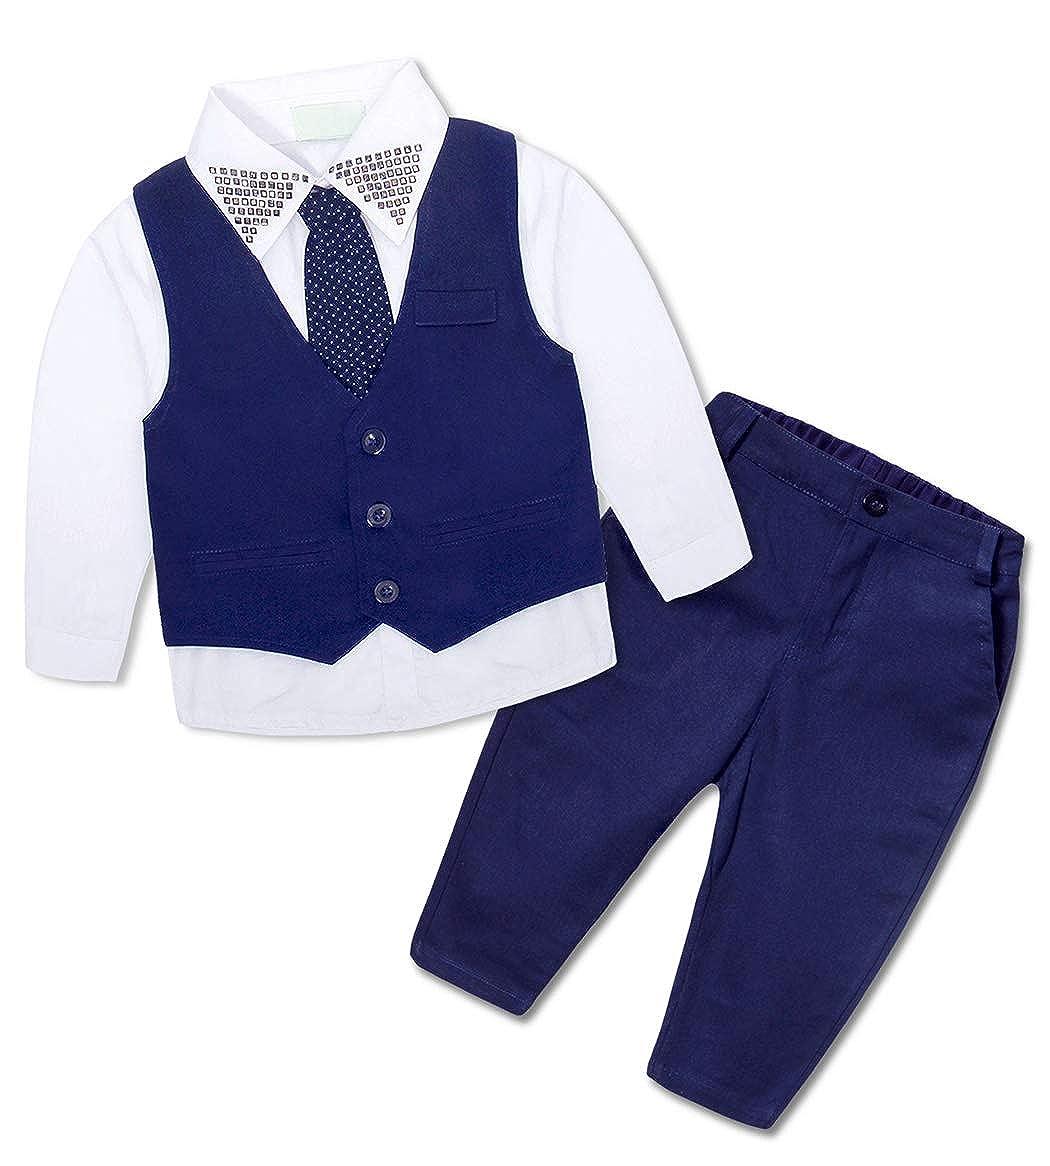 HenzWorld Boys Formal Suit Shirt Vest Waistcoat Pants Tie Party Wedding